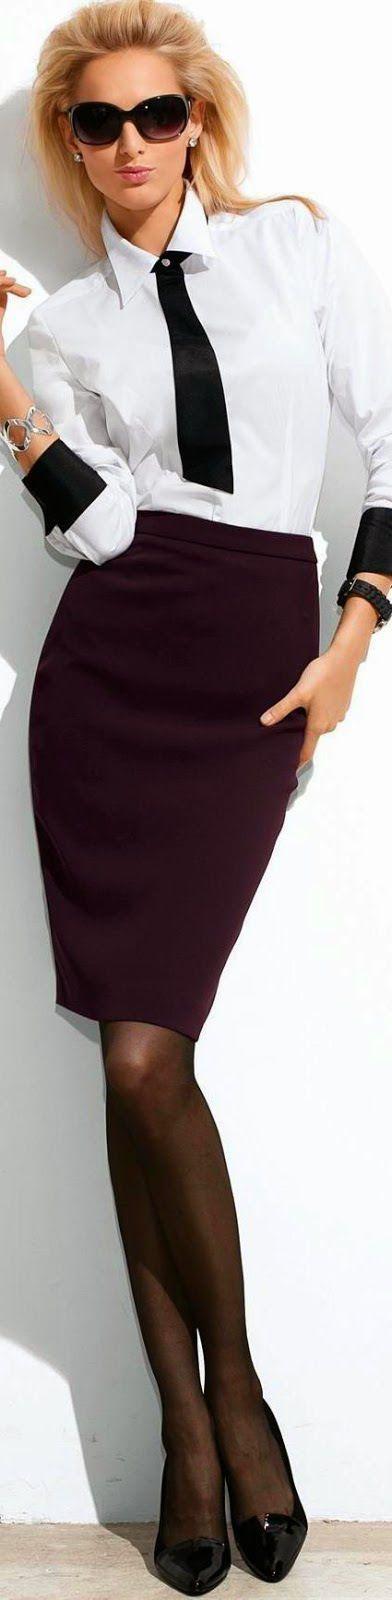 Madeleine Blouse for thé Executive Woman - Luxurydotcom